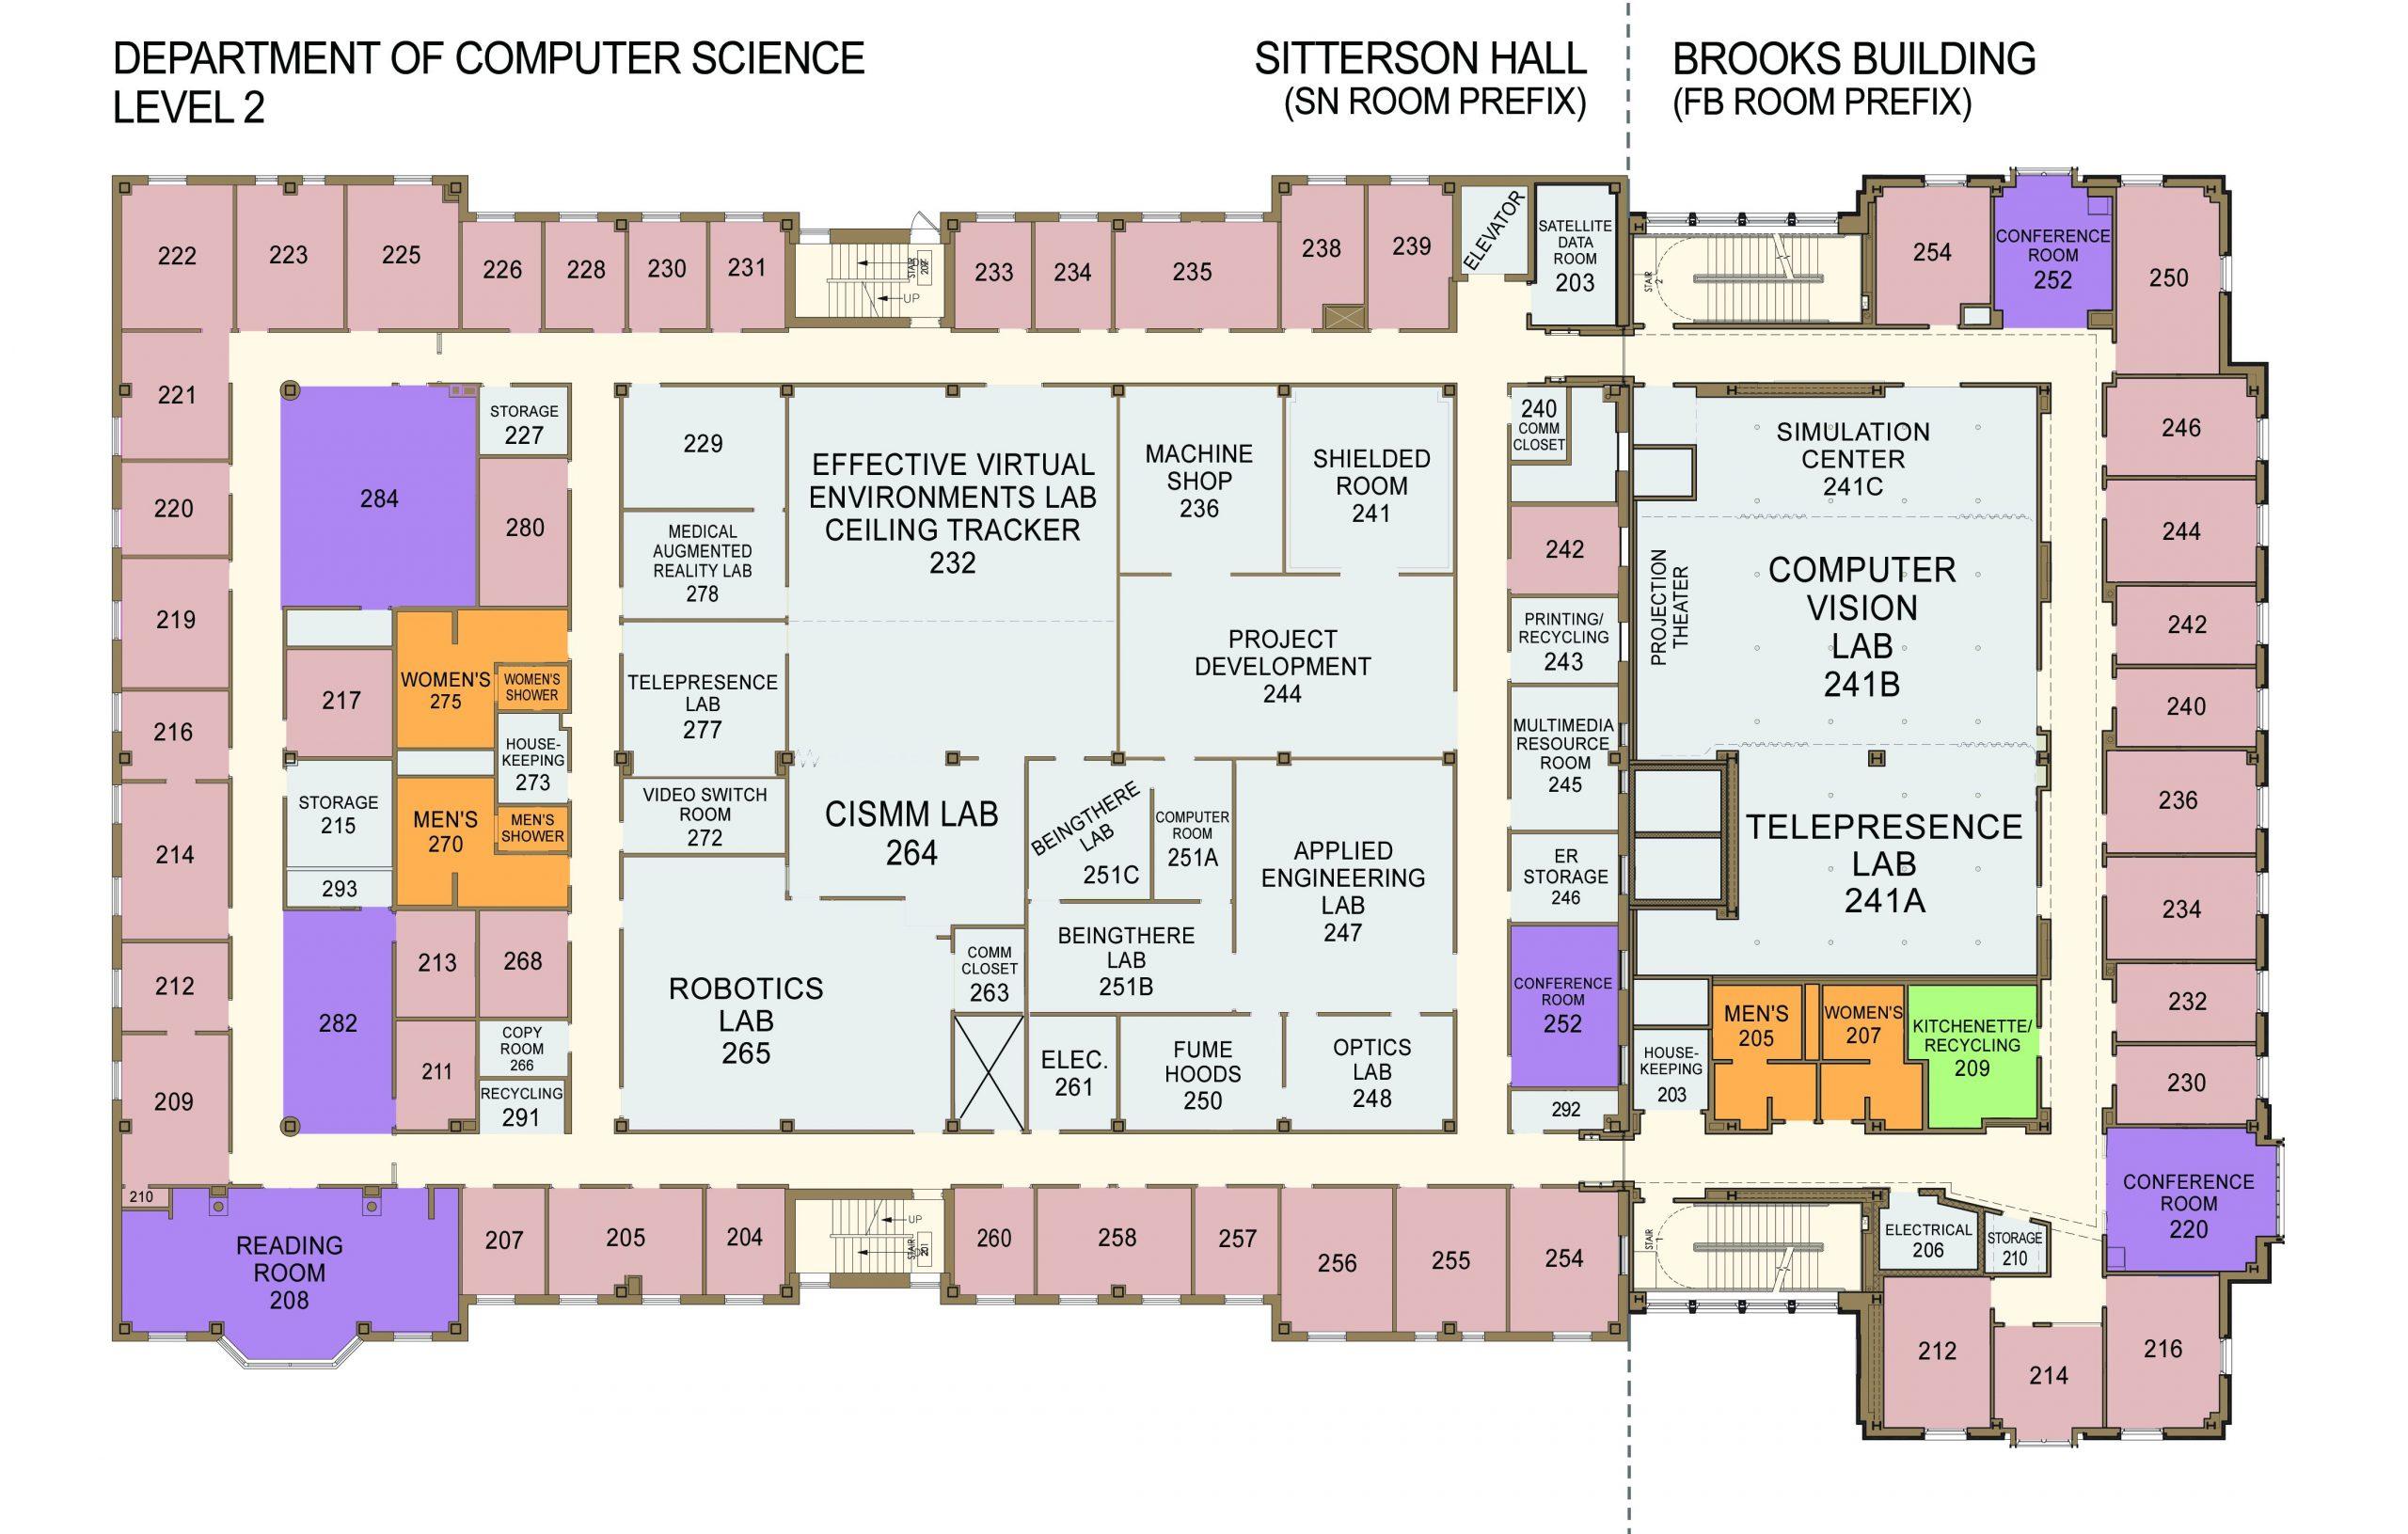 Level 2, Sitterson Hall & Brooks Bldg